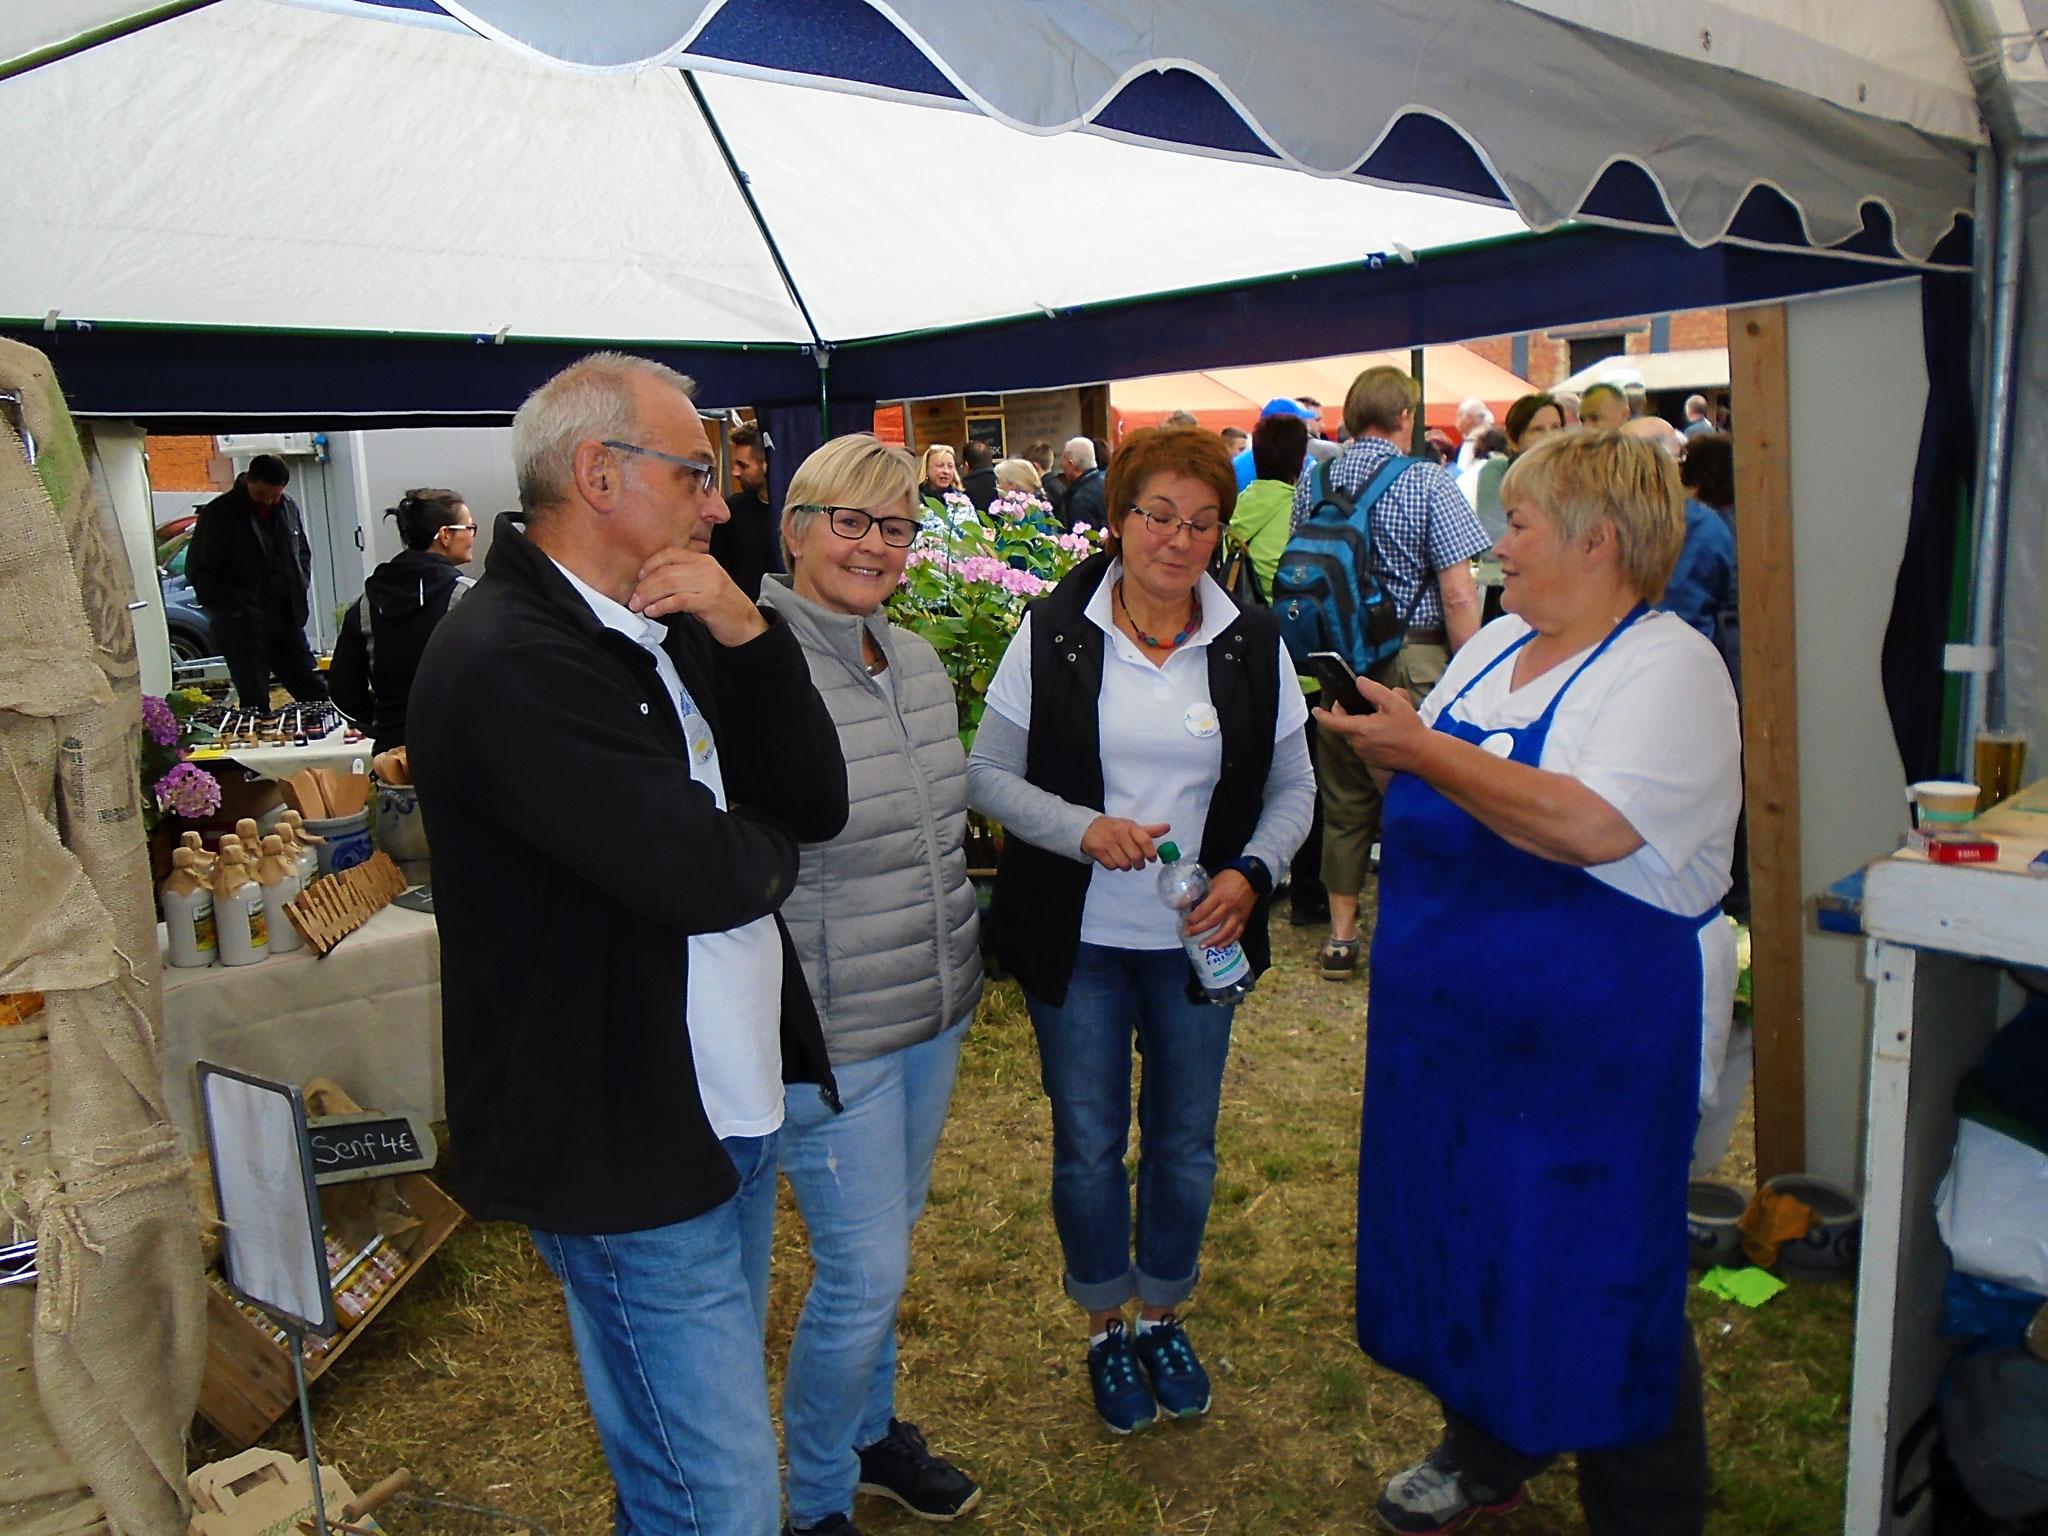 v.l. Gert Pottmann, Marianne Neutze, Jutta Pottmann und Iris Degenhardt